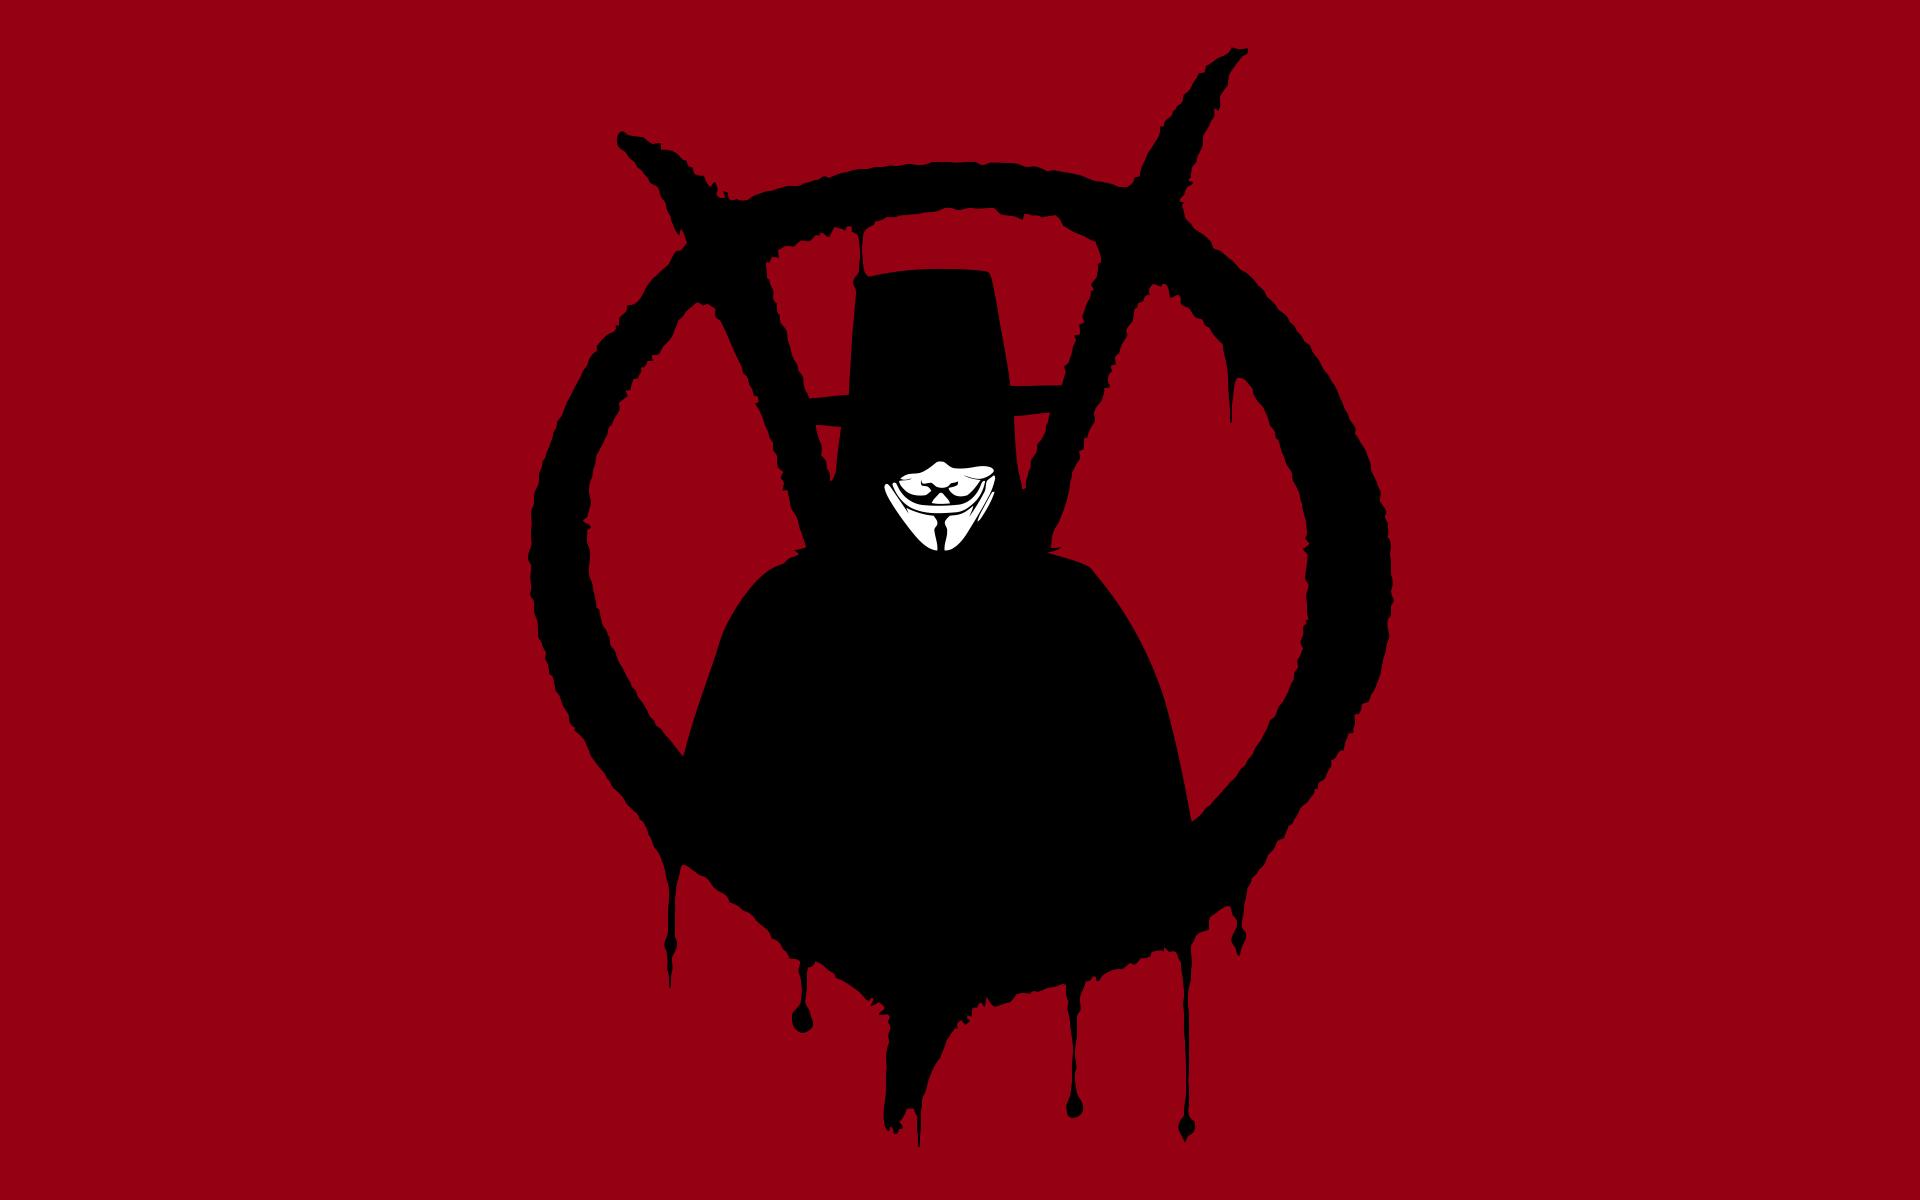 for Vendetta V for Vendetta Wallpaper   DopePicz 1920x1200